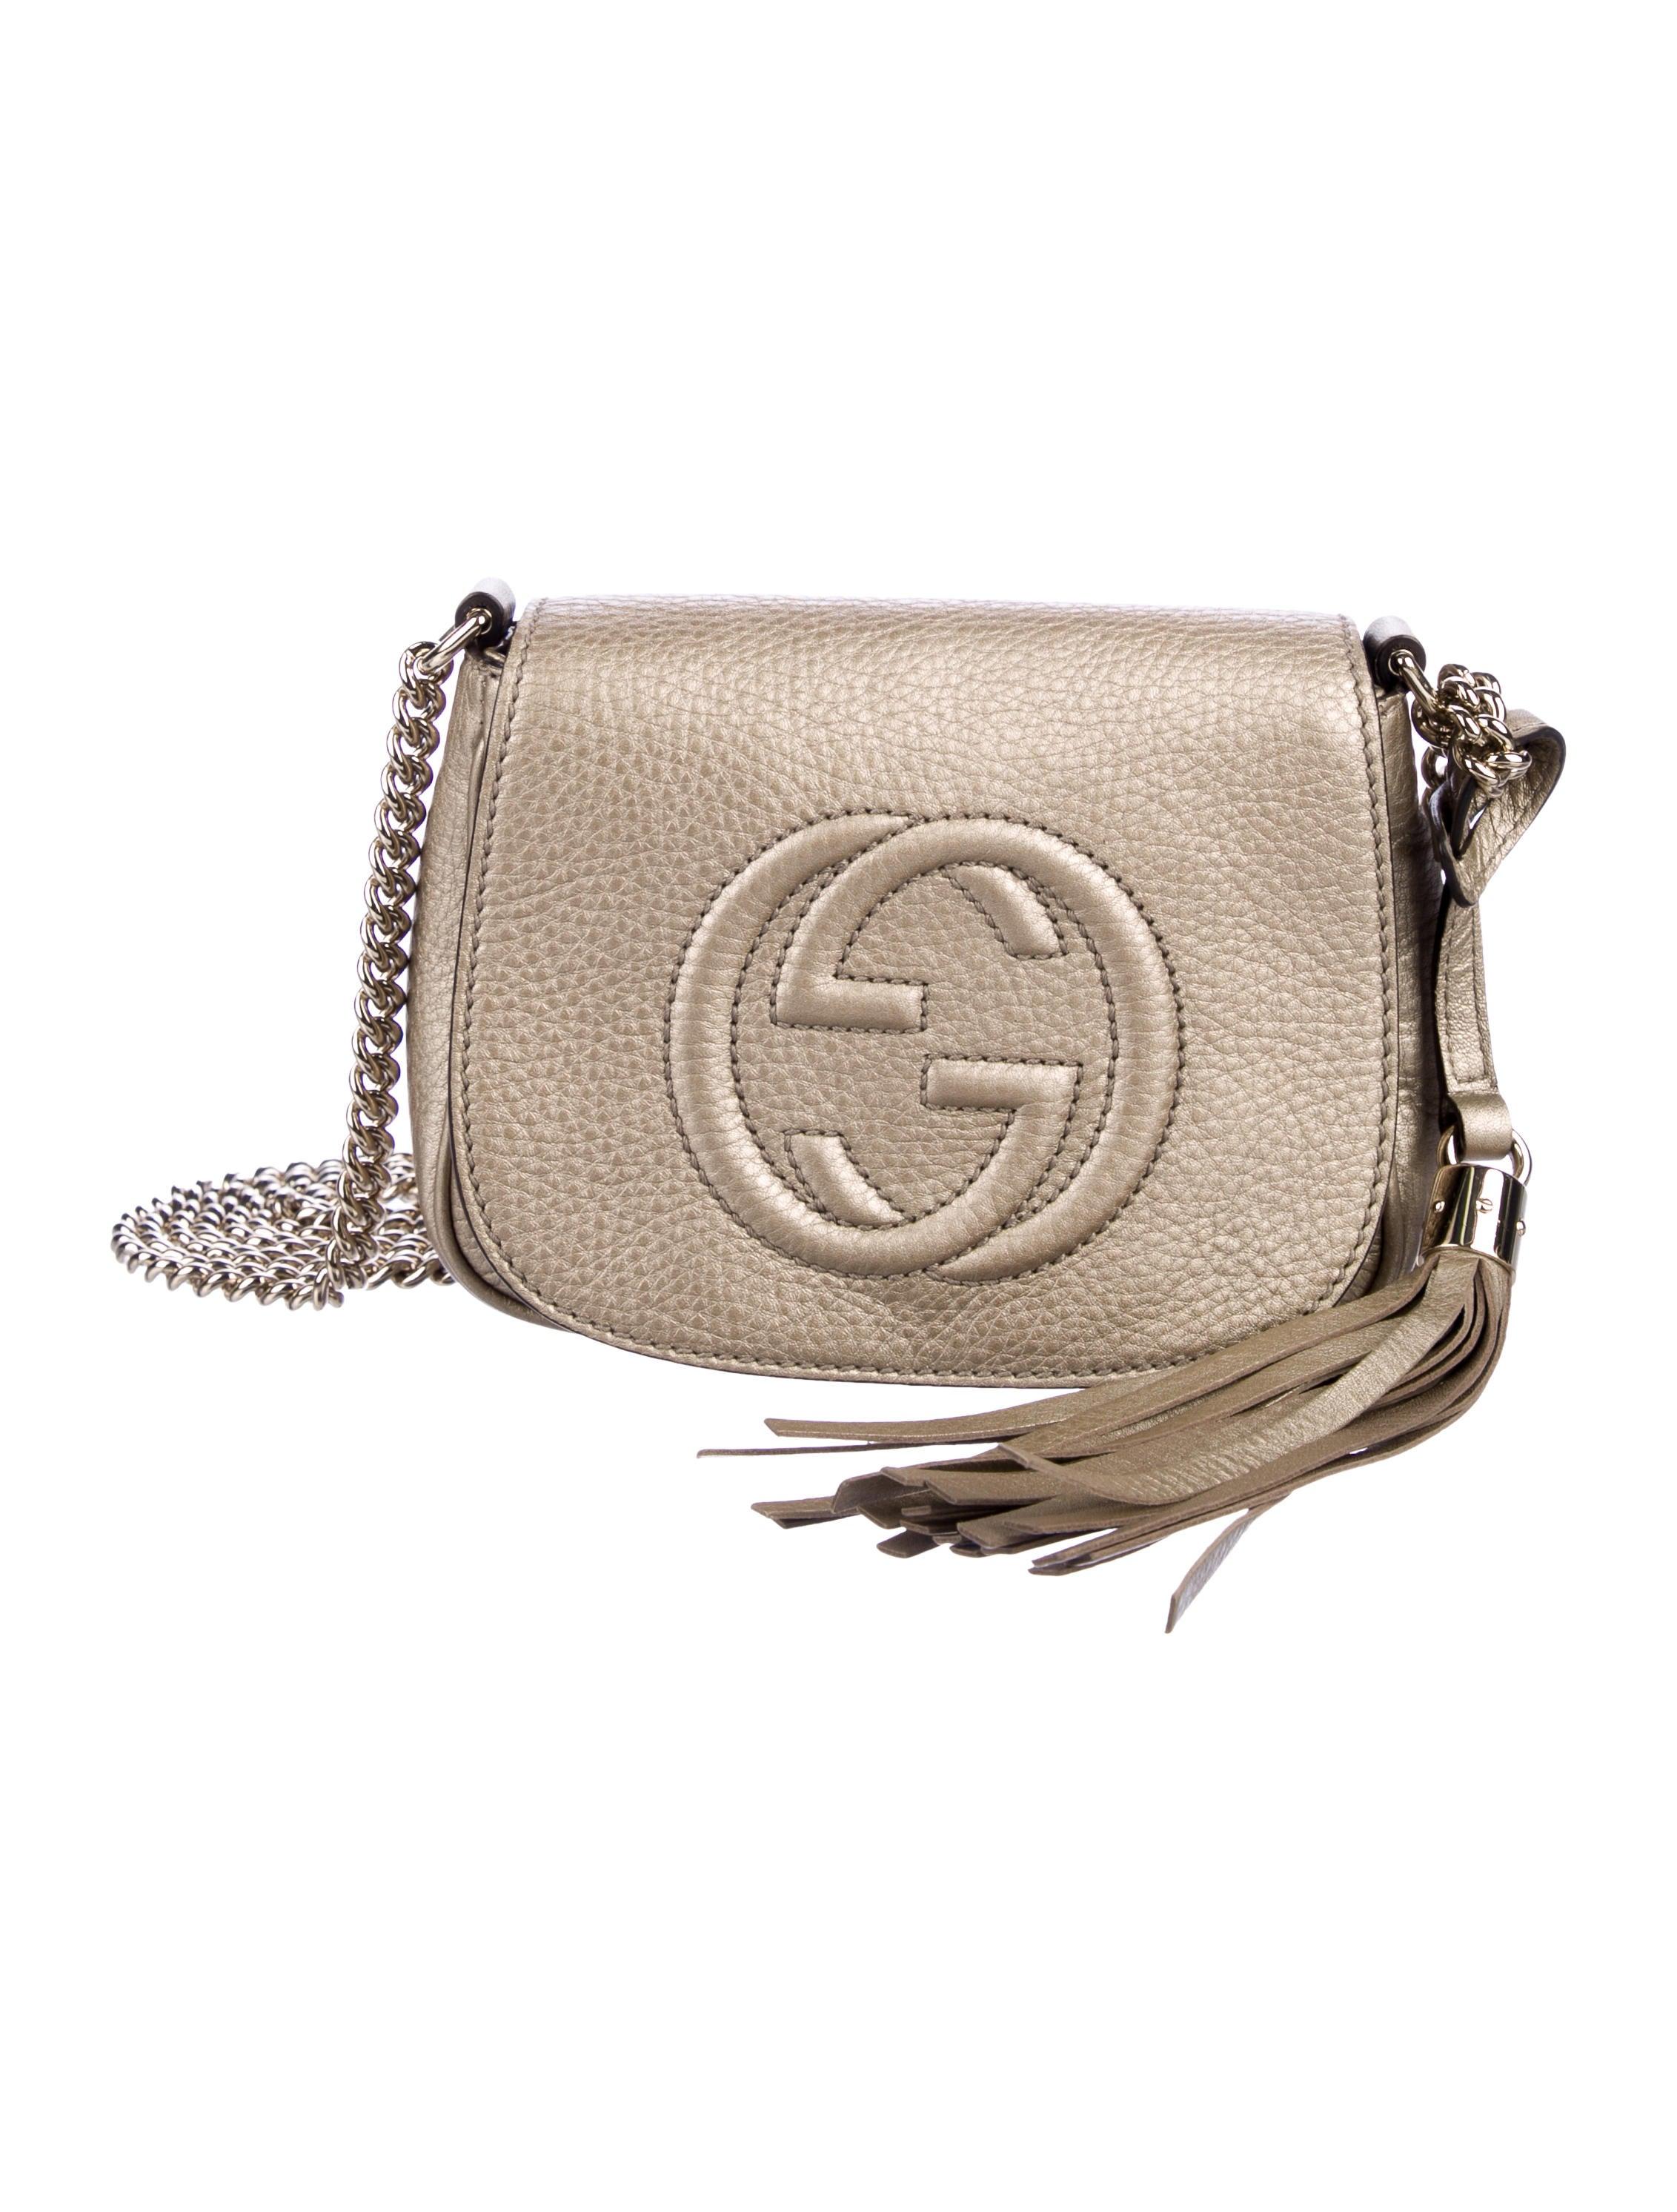 b49d3ea5093f Gucci Soho Chain Crossbody Bag - Handbags - GUC309055 | The RealReal